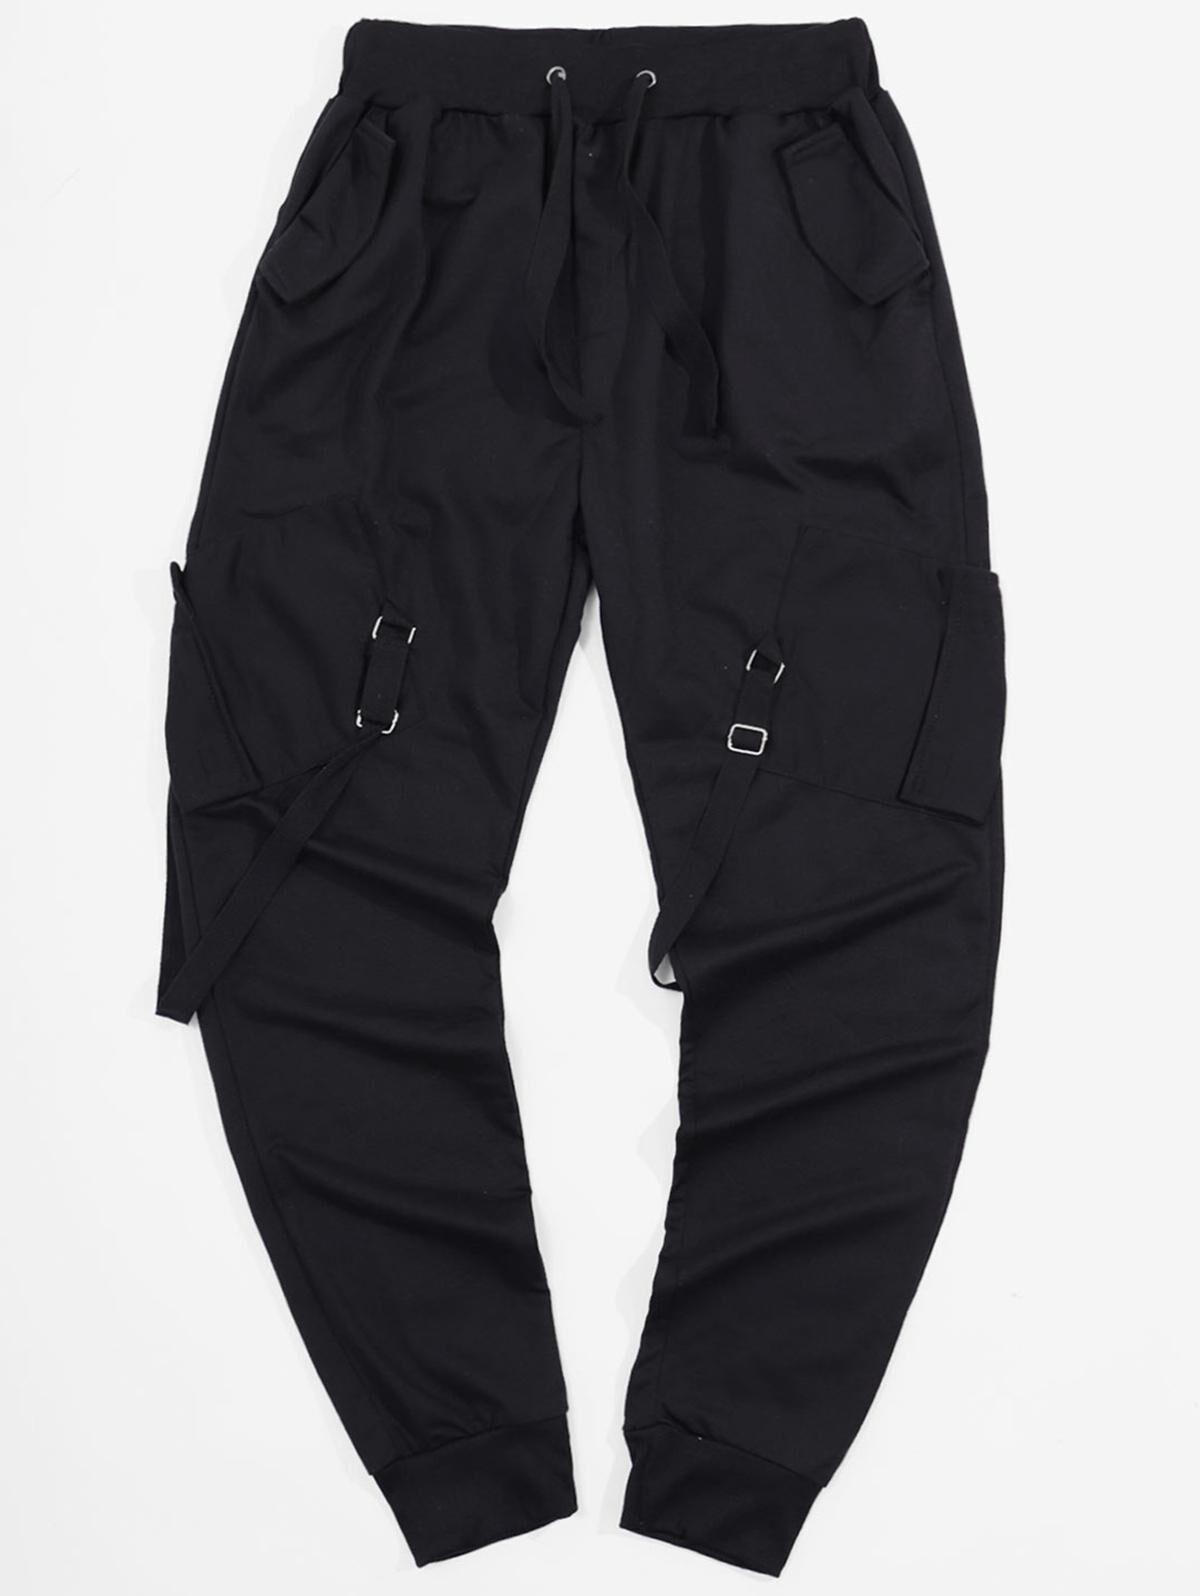 Ribbon Pockets Long Elastic Sport Cargo Pants in BLACK - Size: Large